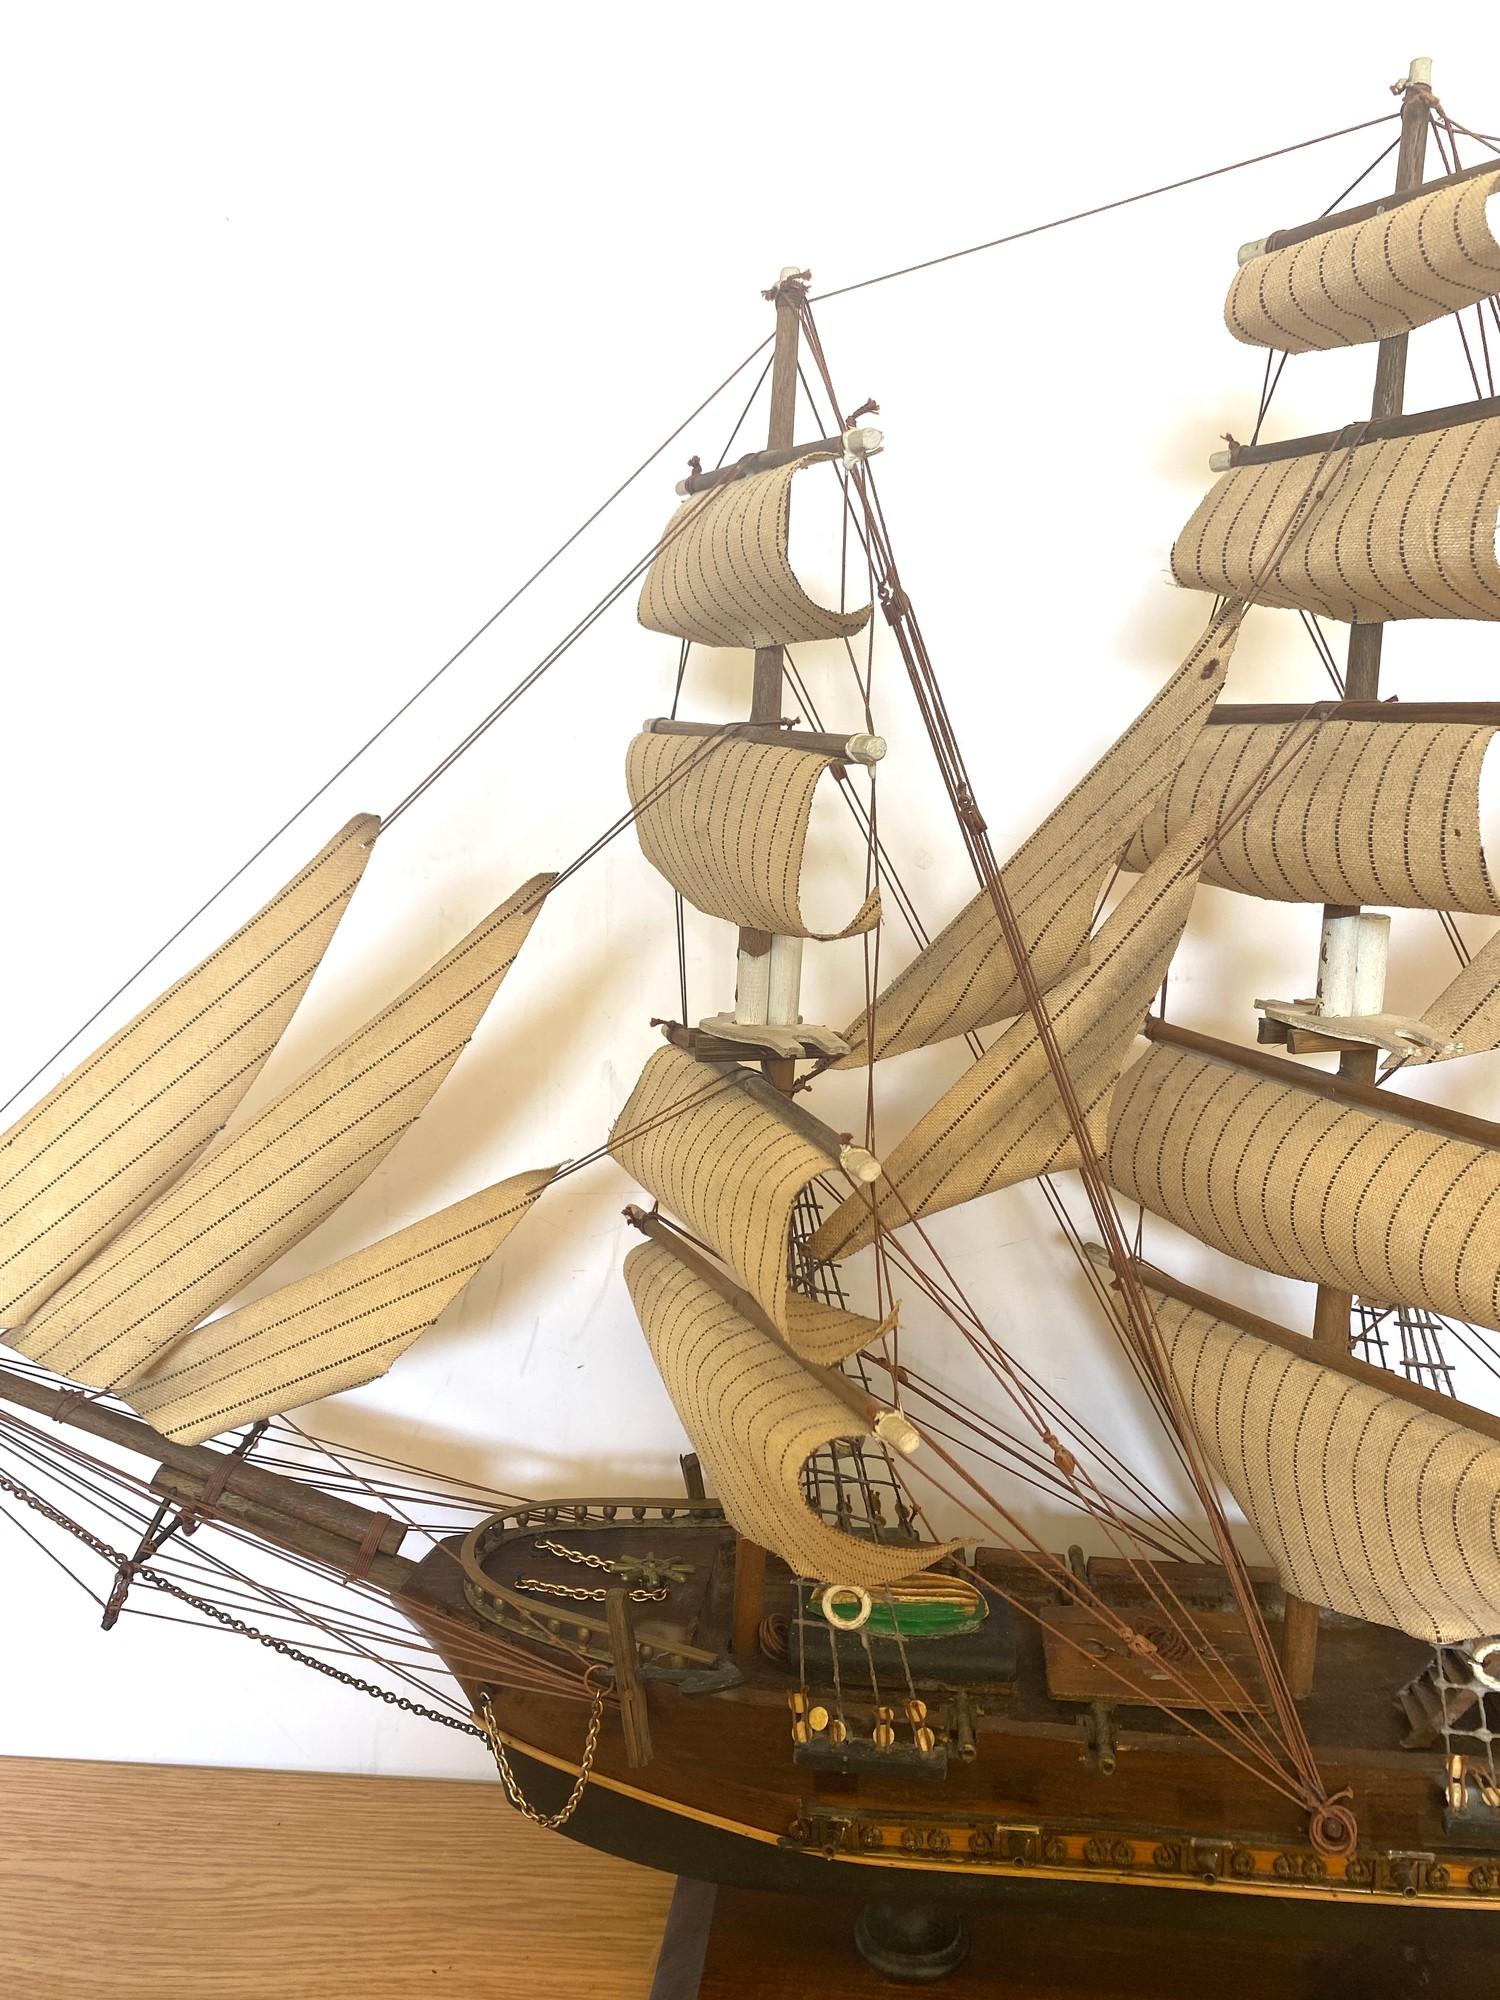 Model galleon Fragata siglo - Image 2 of 4